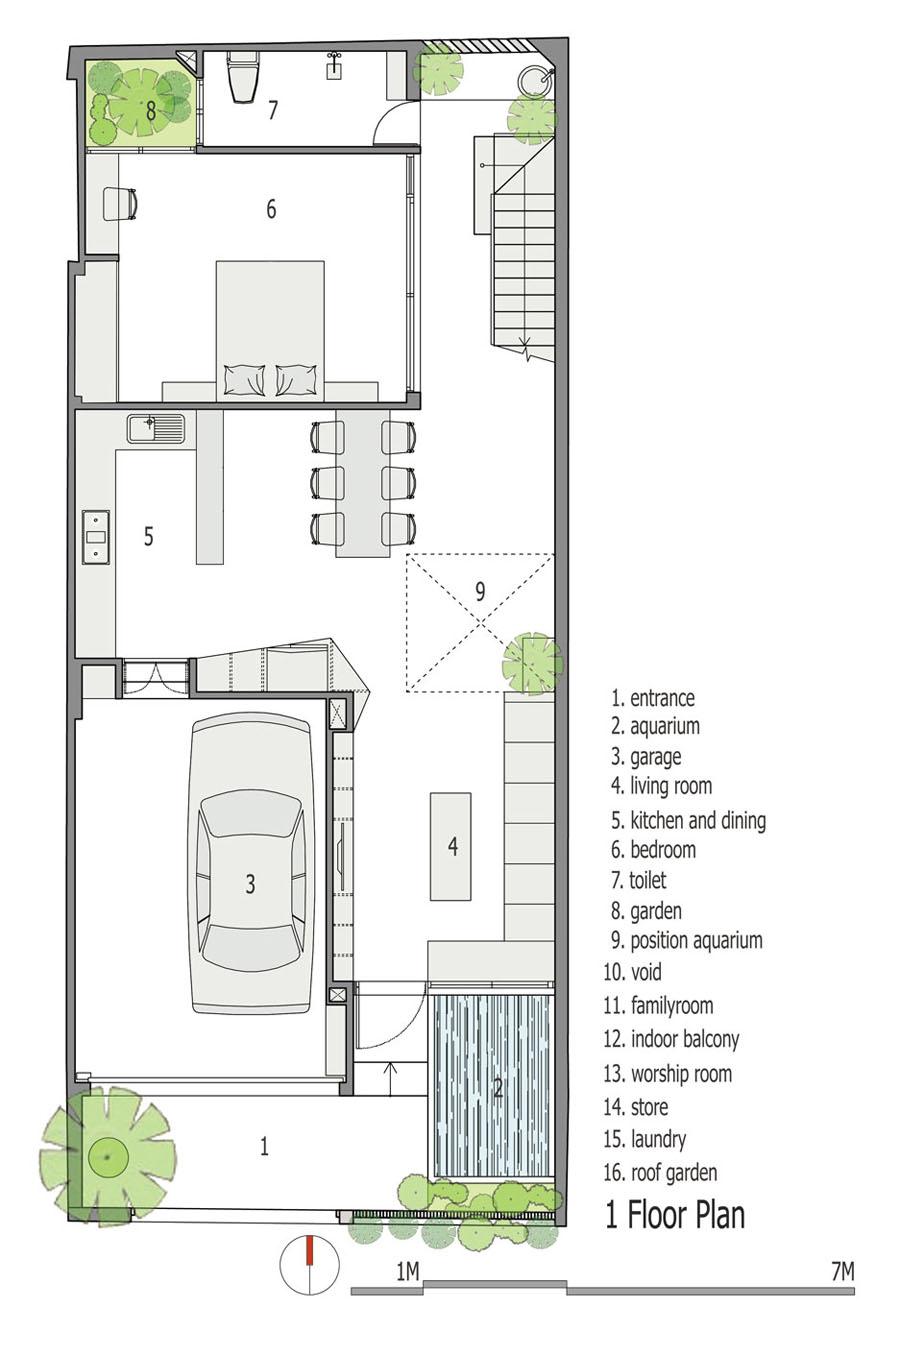 22house-kienviet-net-A.-1-floor-plan